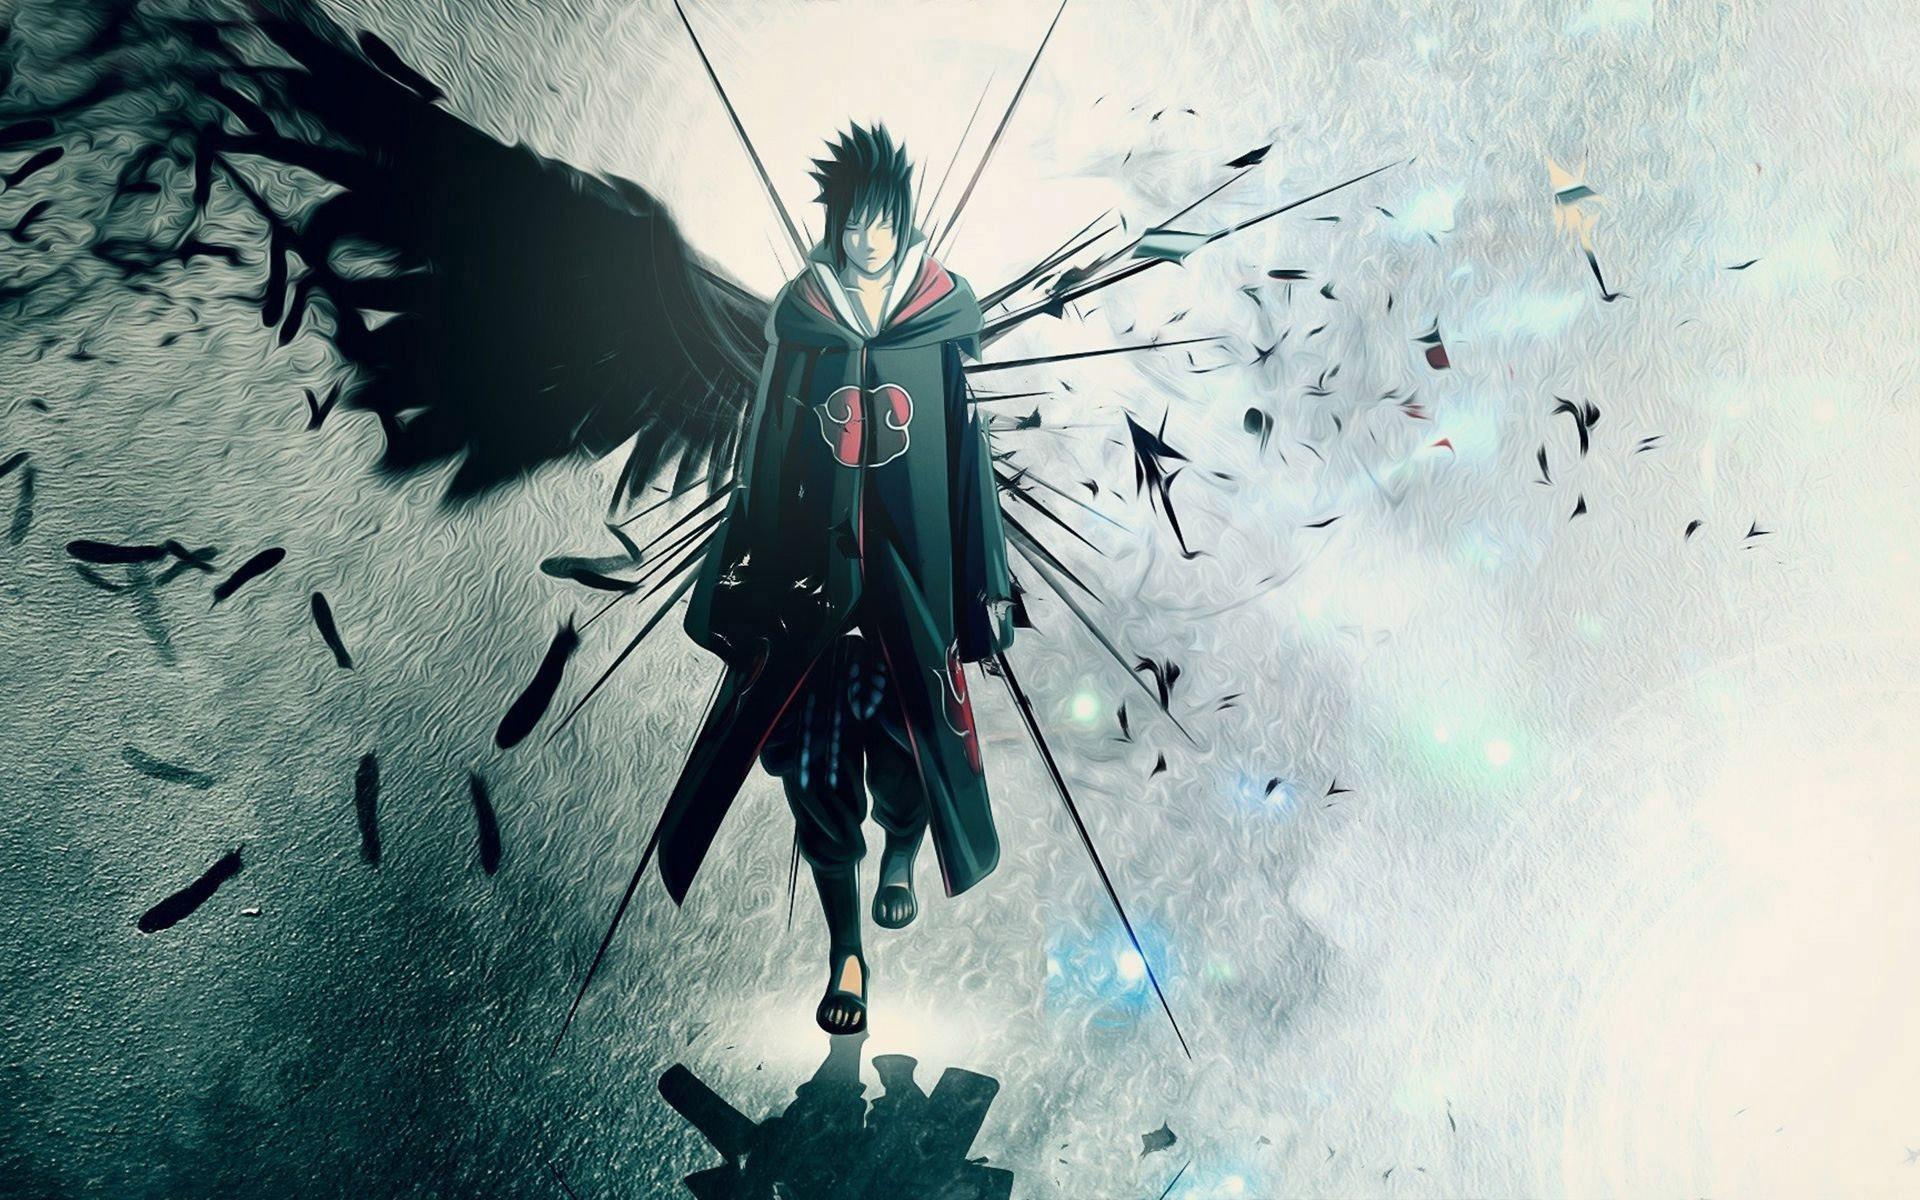 Anime 1920x1200 anime Uchiha Sasuke Naruto Shippuuden Road to Ninja: Naruto the Movie Akatsuki anime boys wings feathers cyan